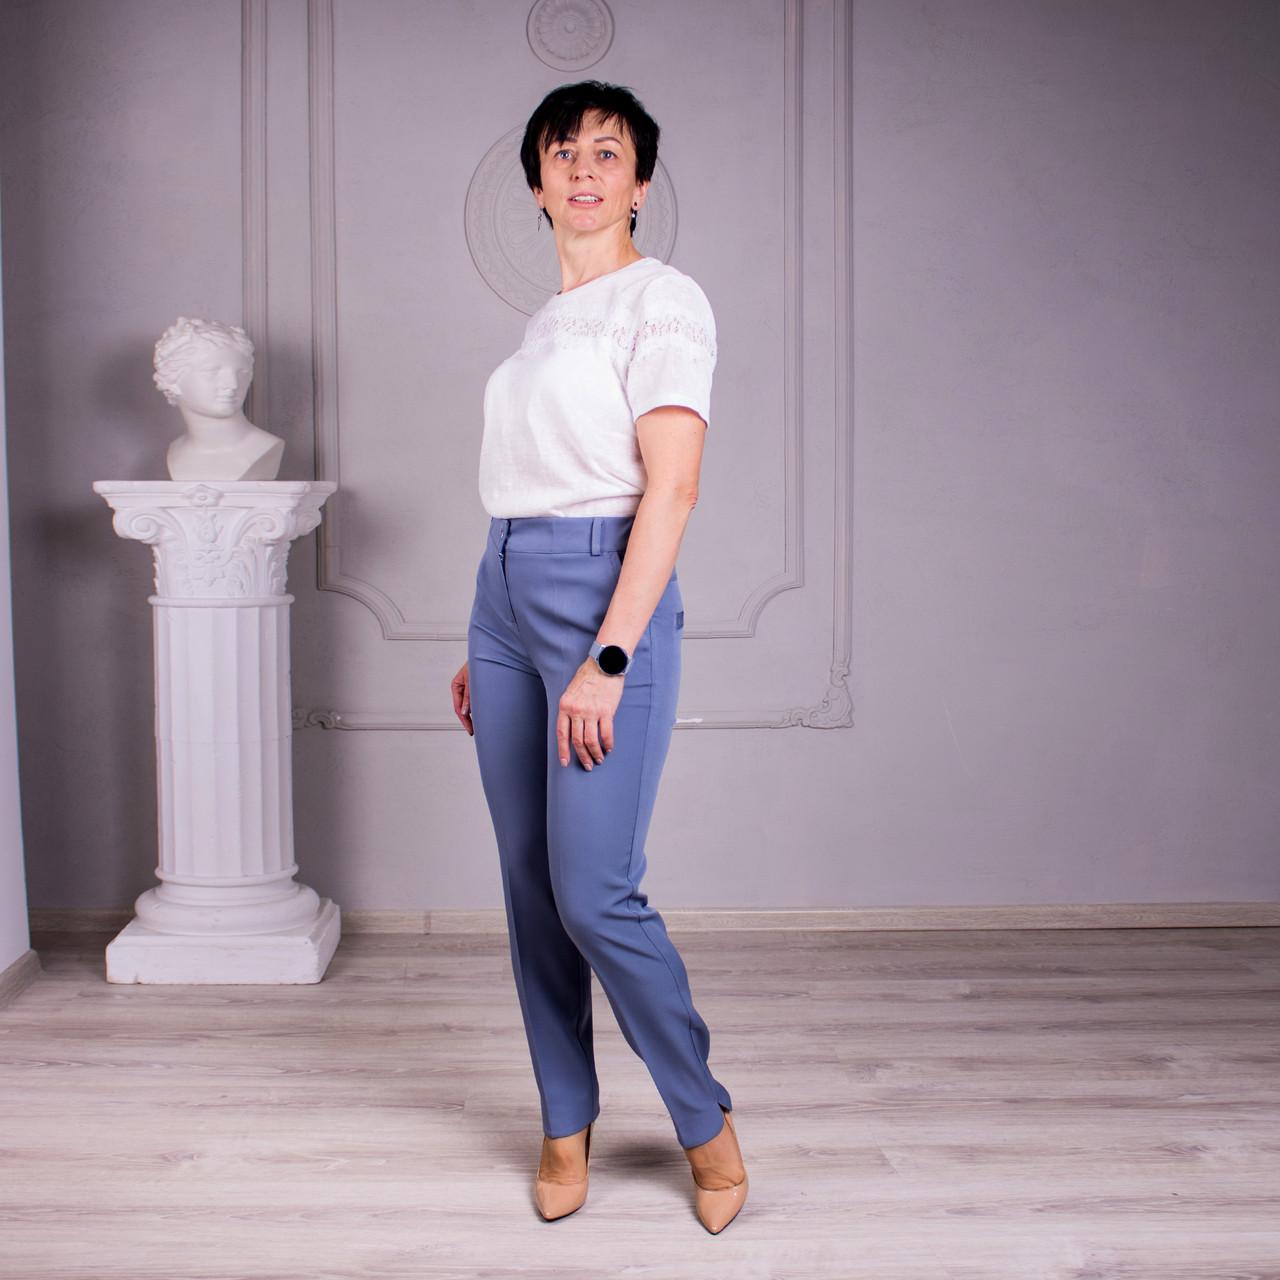 Женские брюки Салина цвет беж, серый, чёрный размер 46- 58